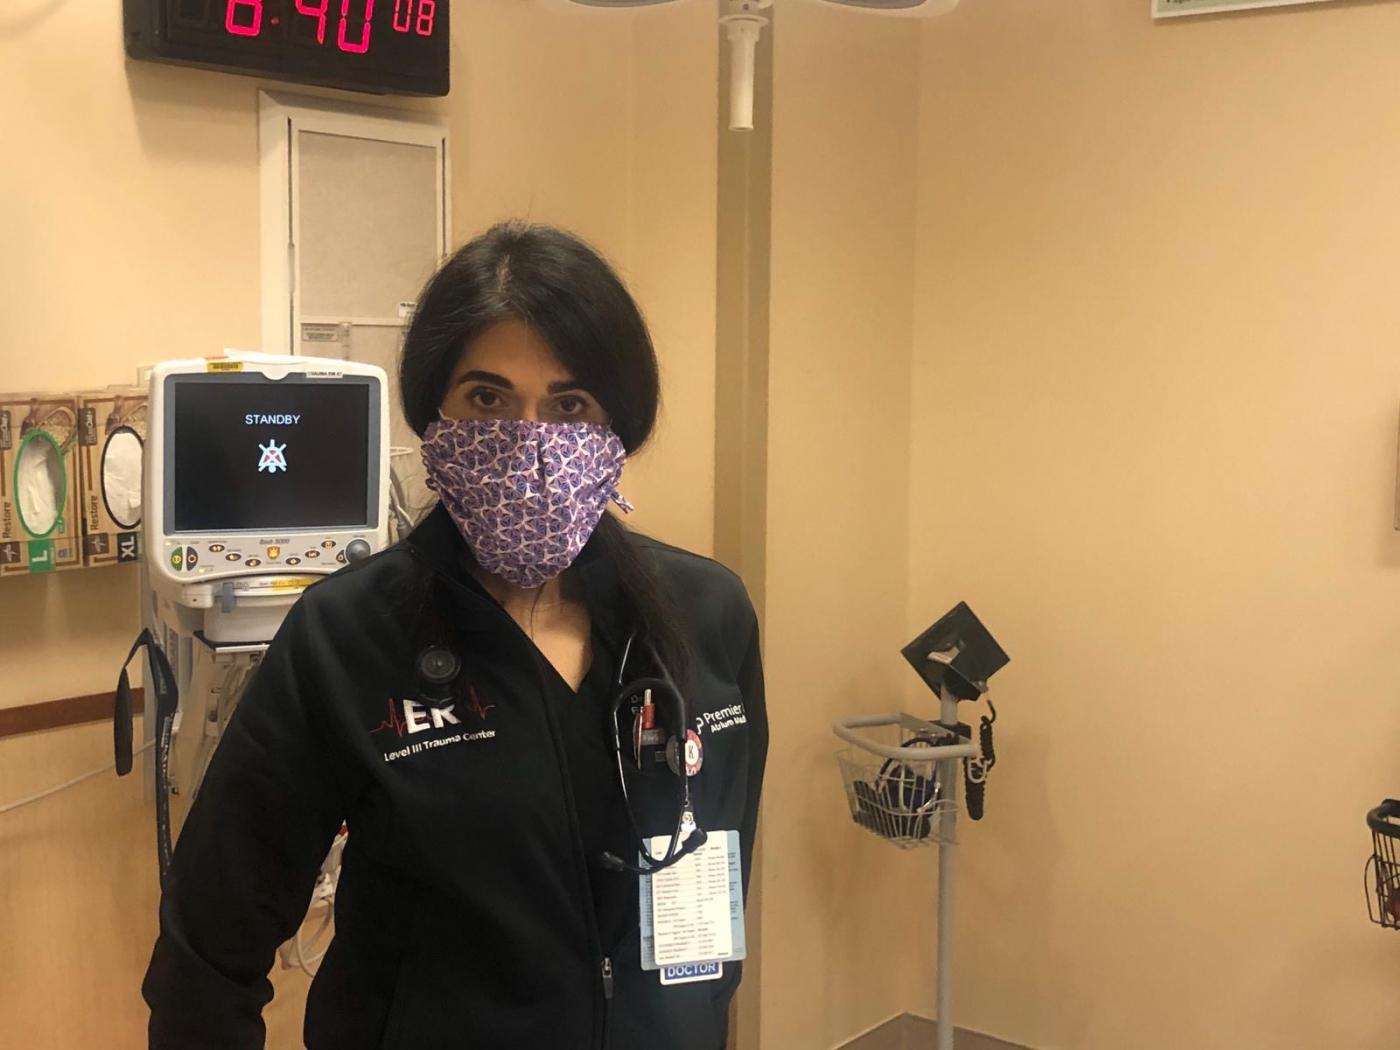 Coronavirus: US Muslims Pitch into Help Frontline Health Workers